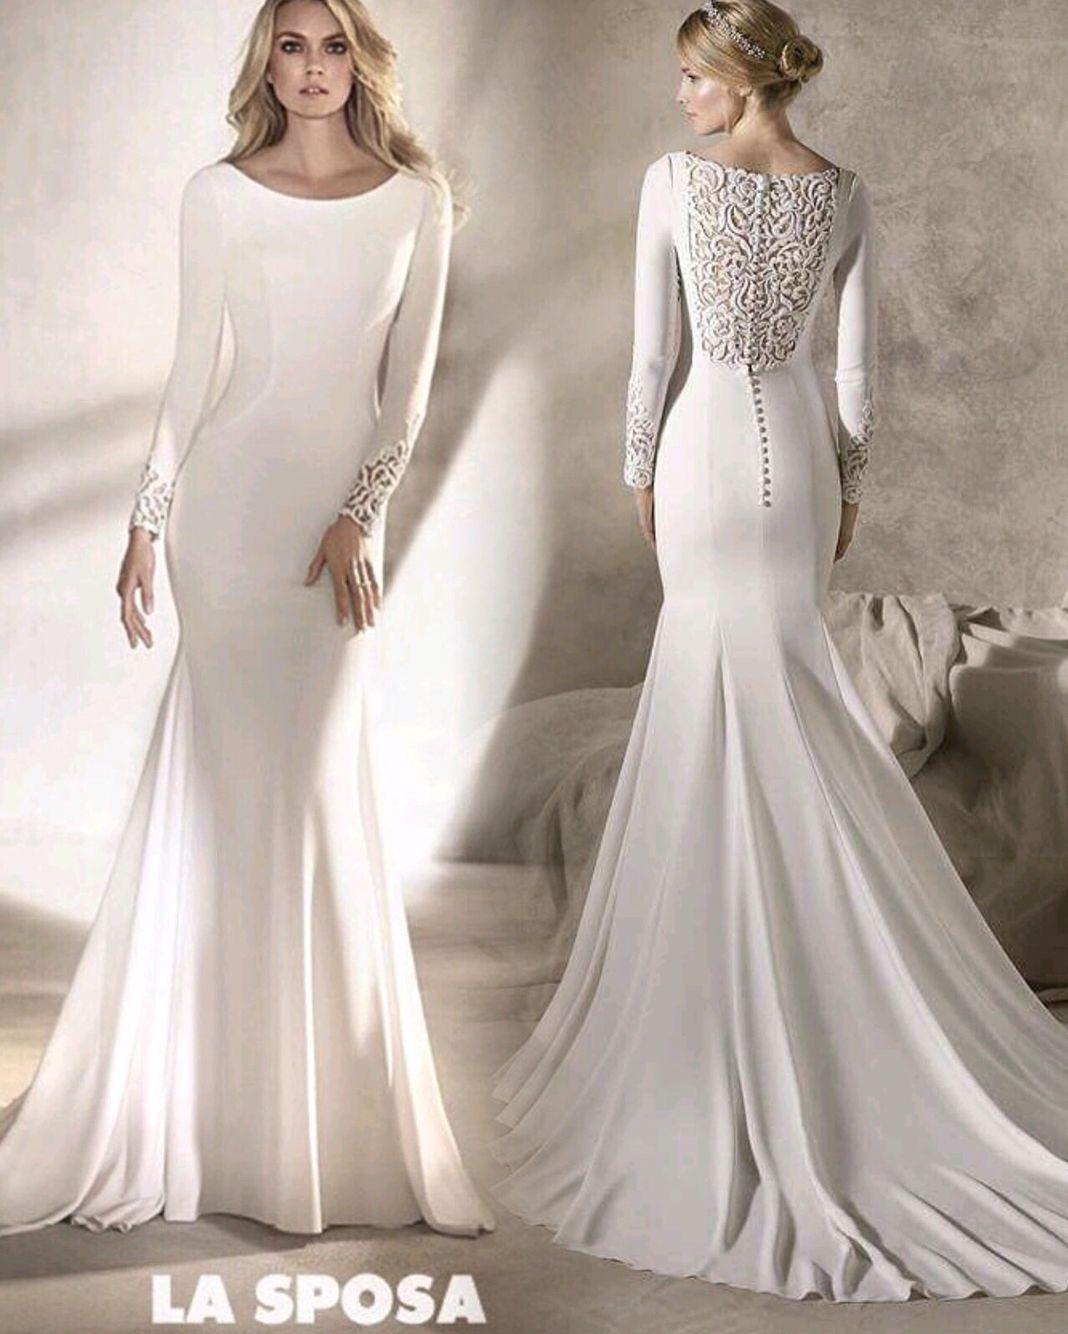 La sposa by pronovias fashion group long sleeved plain crepe